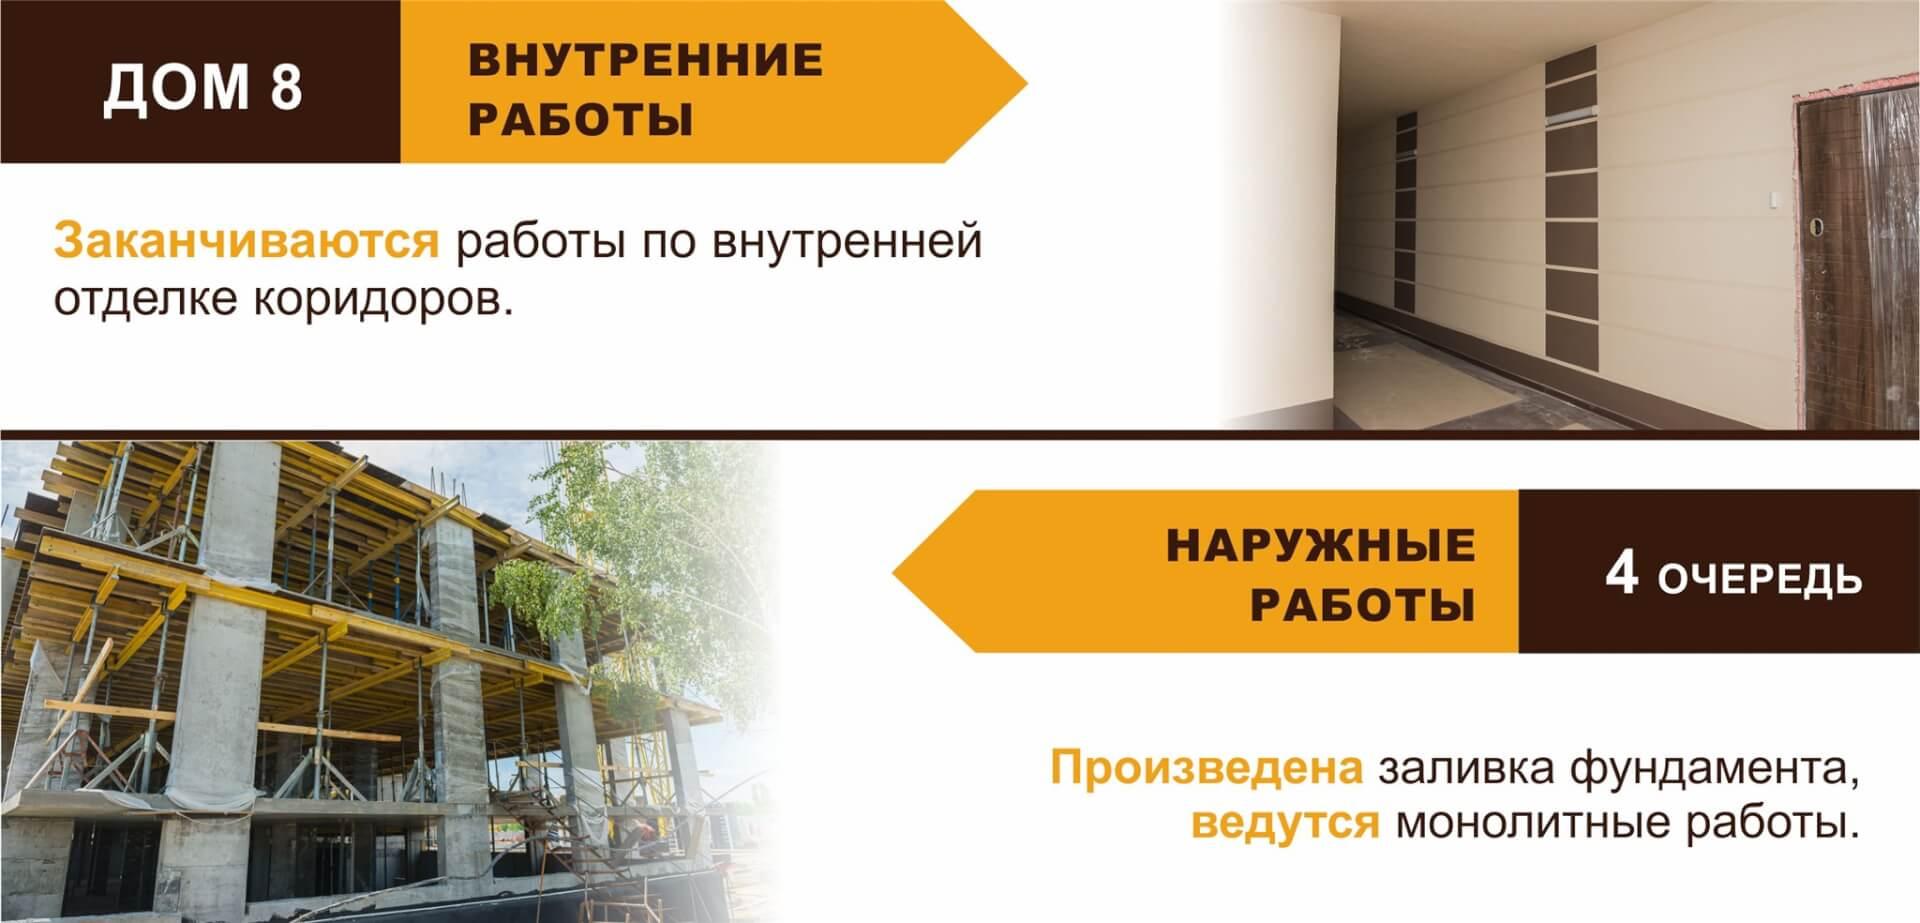 news_26-05-17-ru